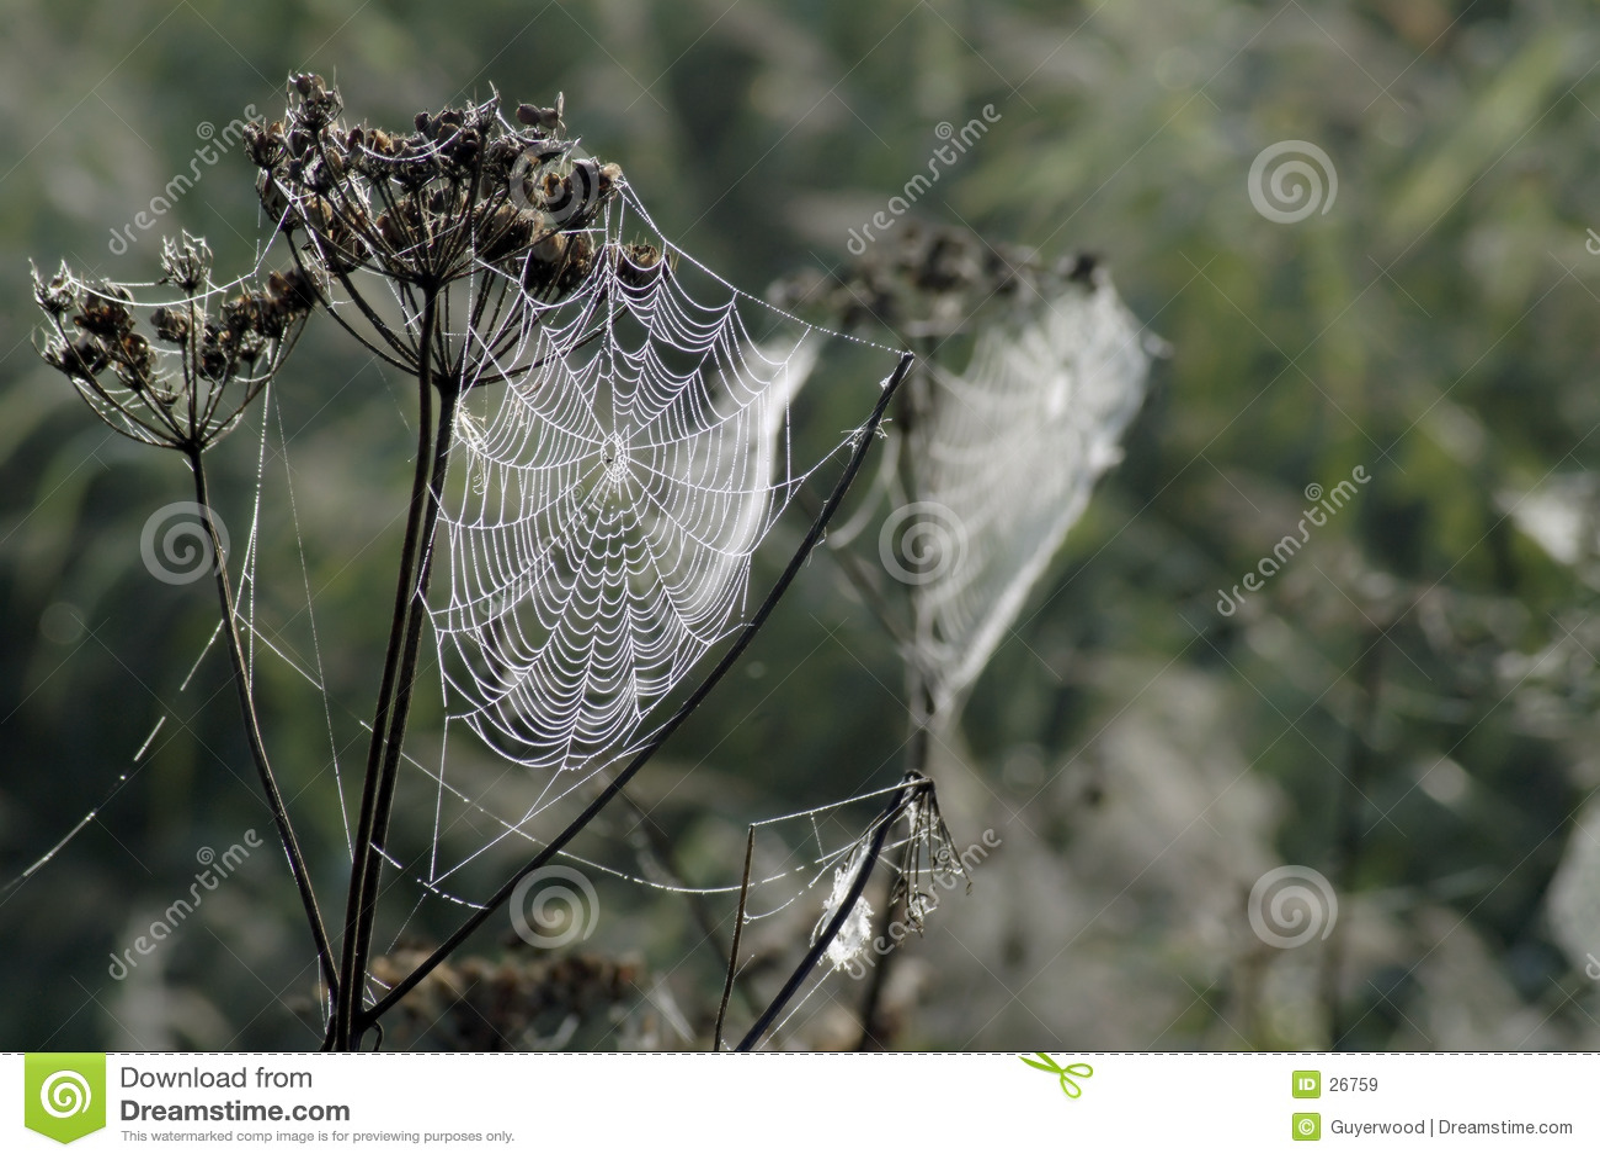 Dauw op spinneweb